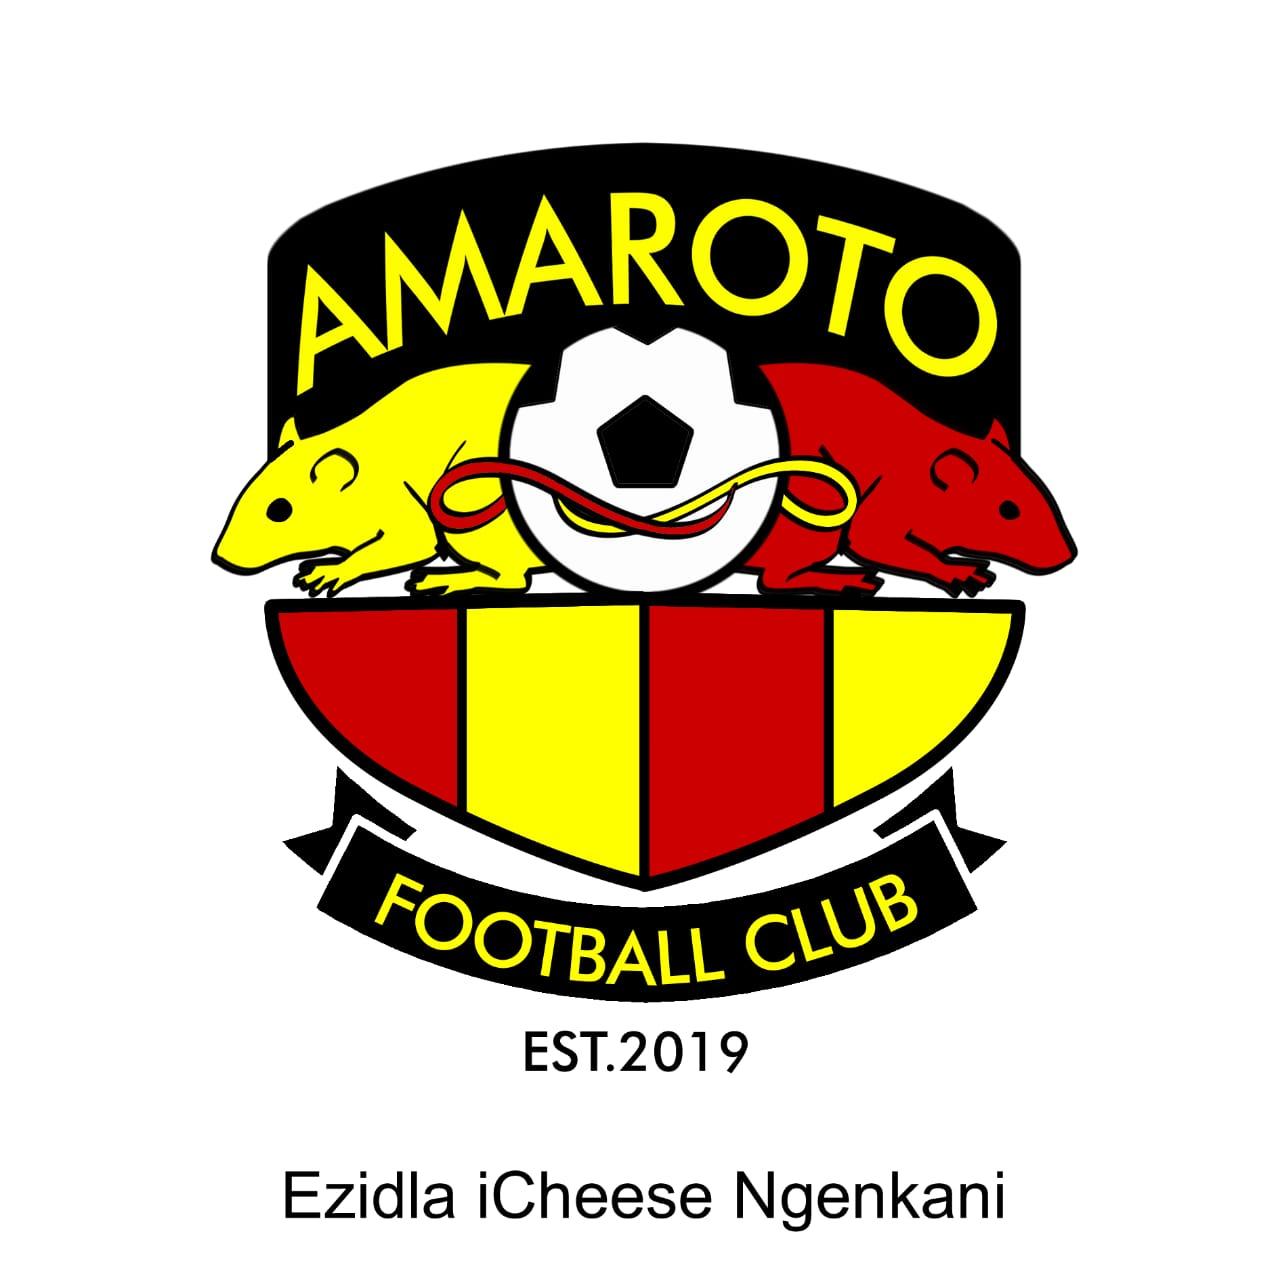 Amaroto FC logo